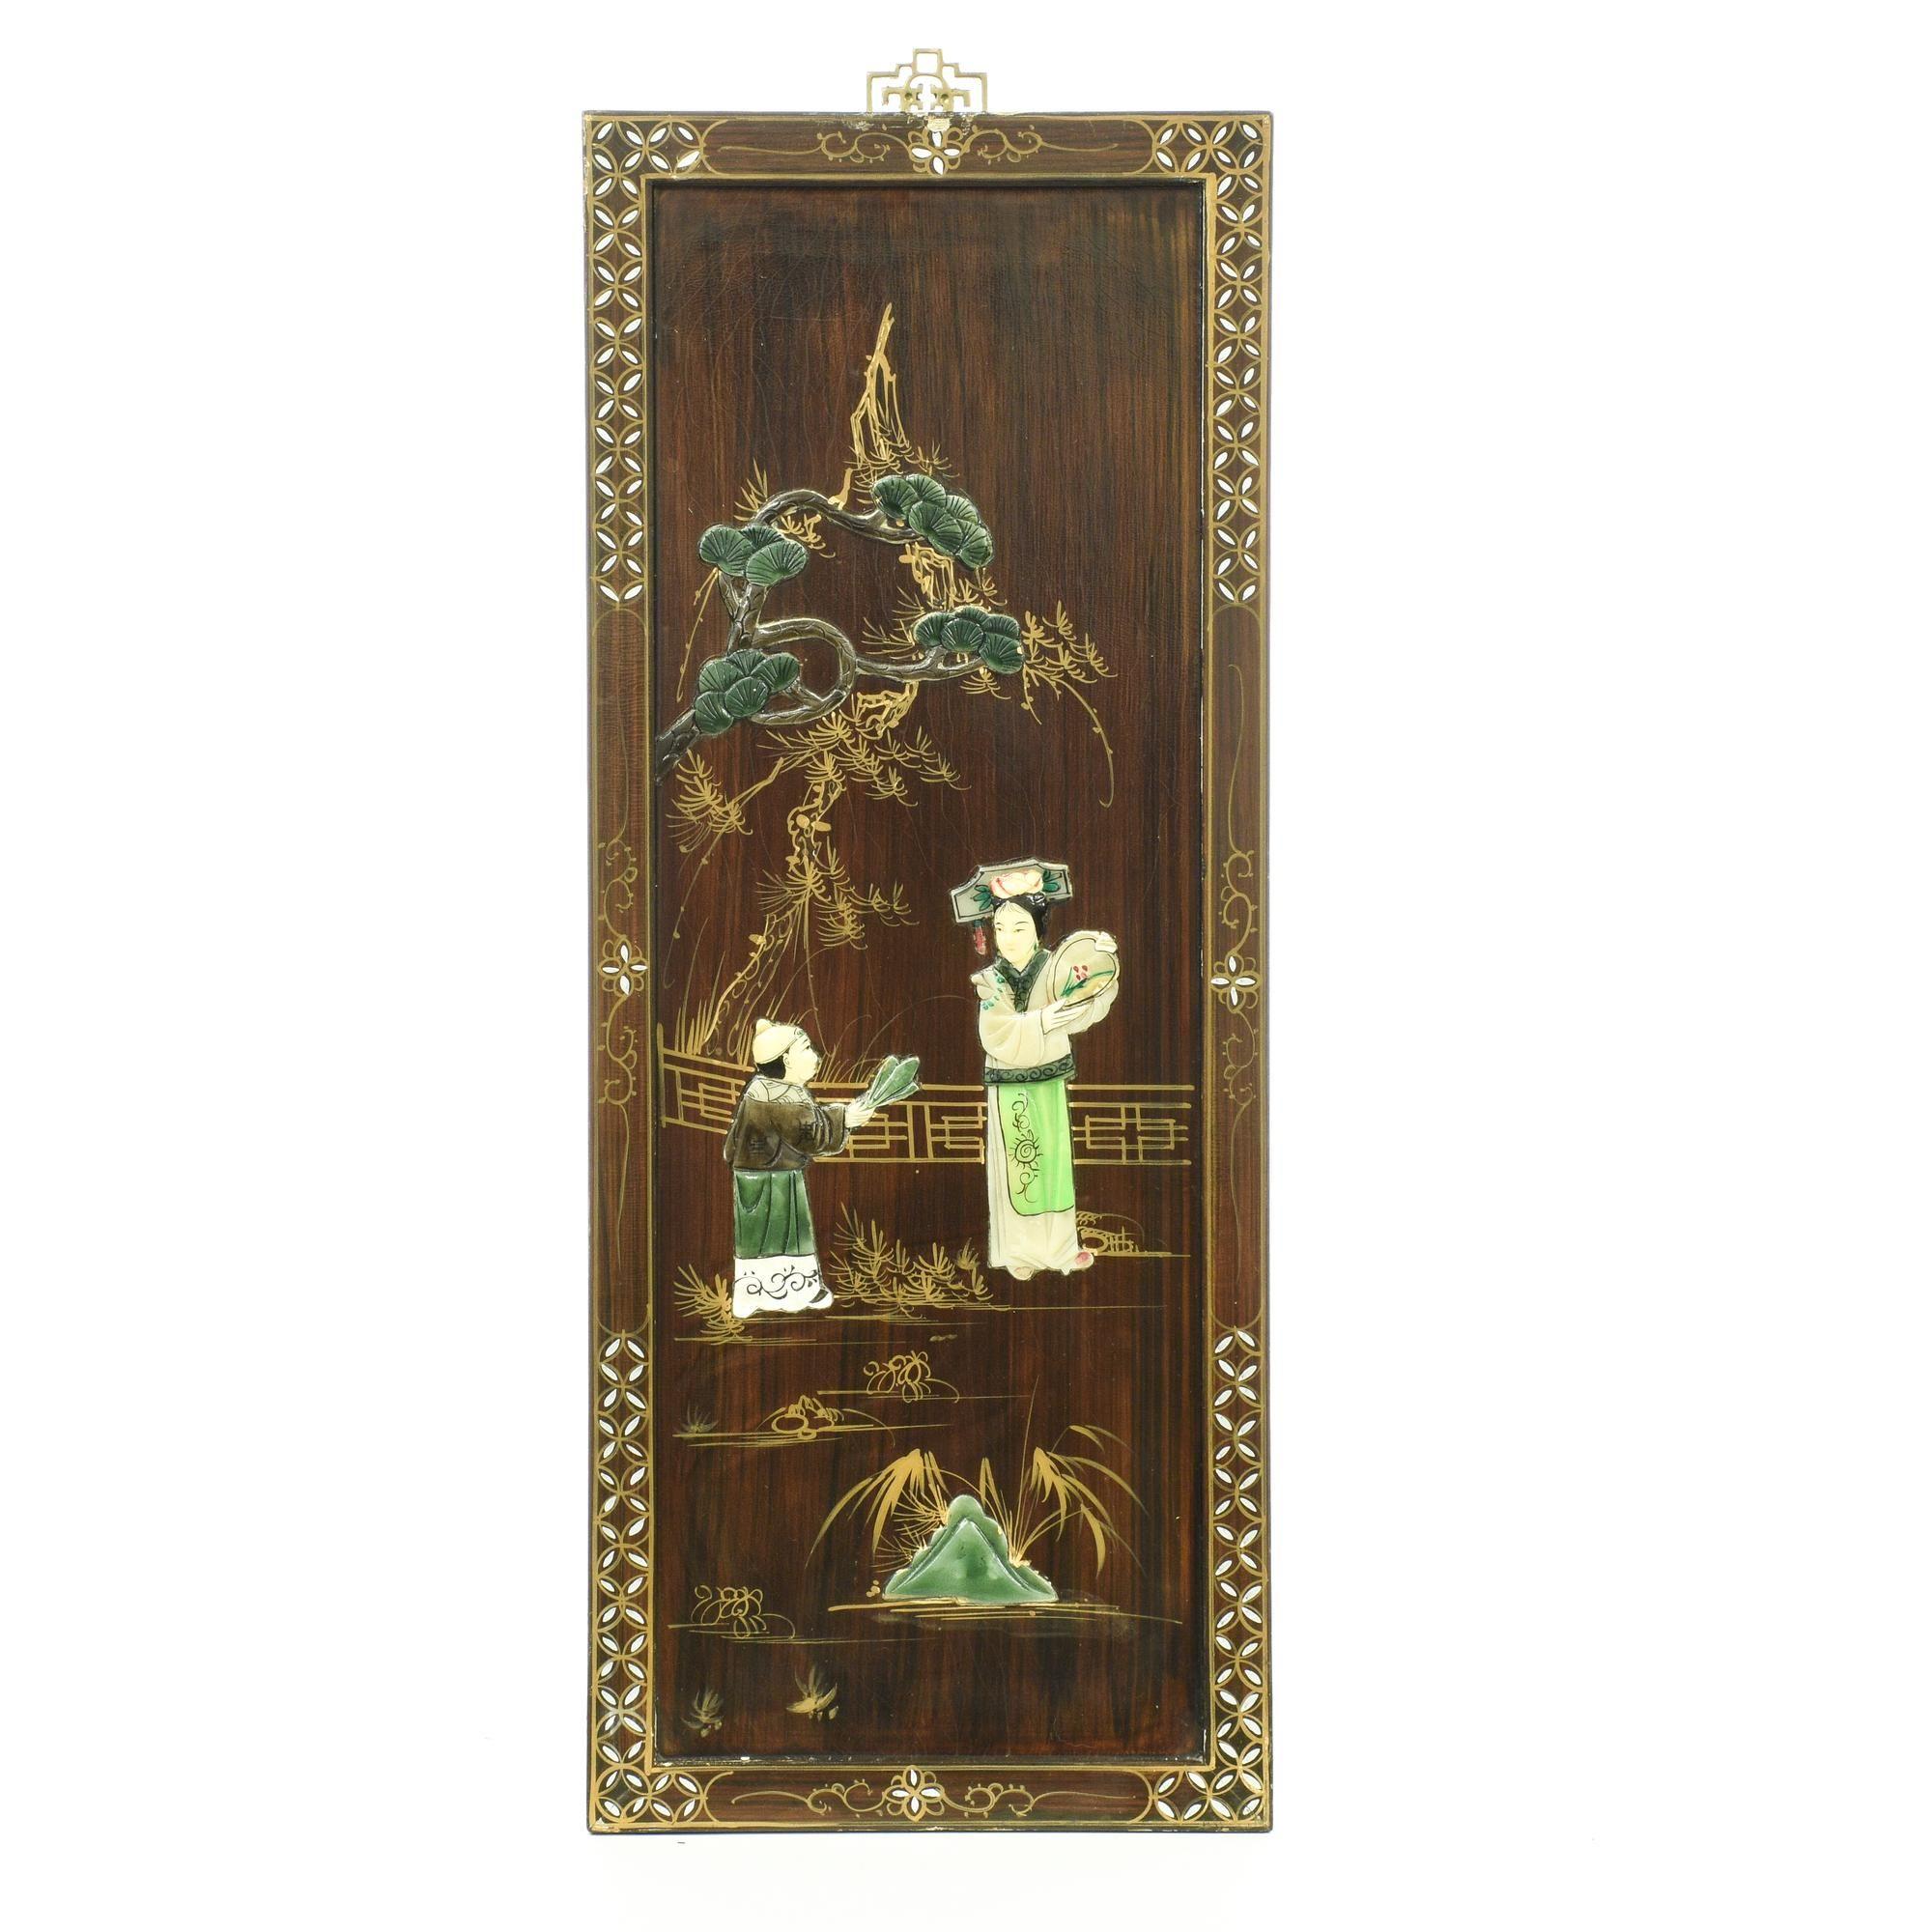 Asian decor decorativeaccents sandiegovintage vintagefurniture